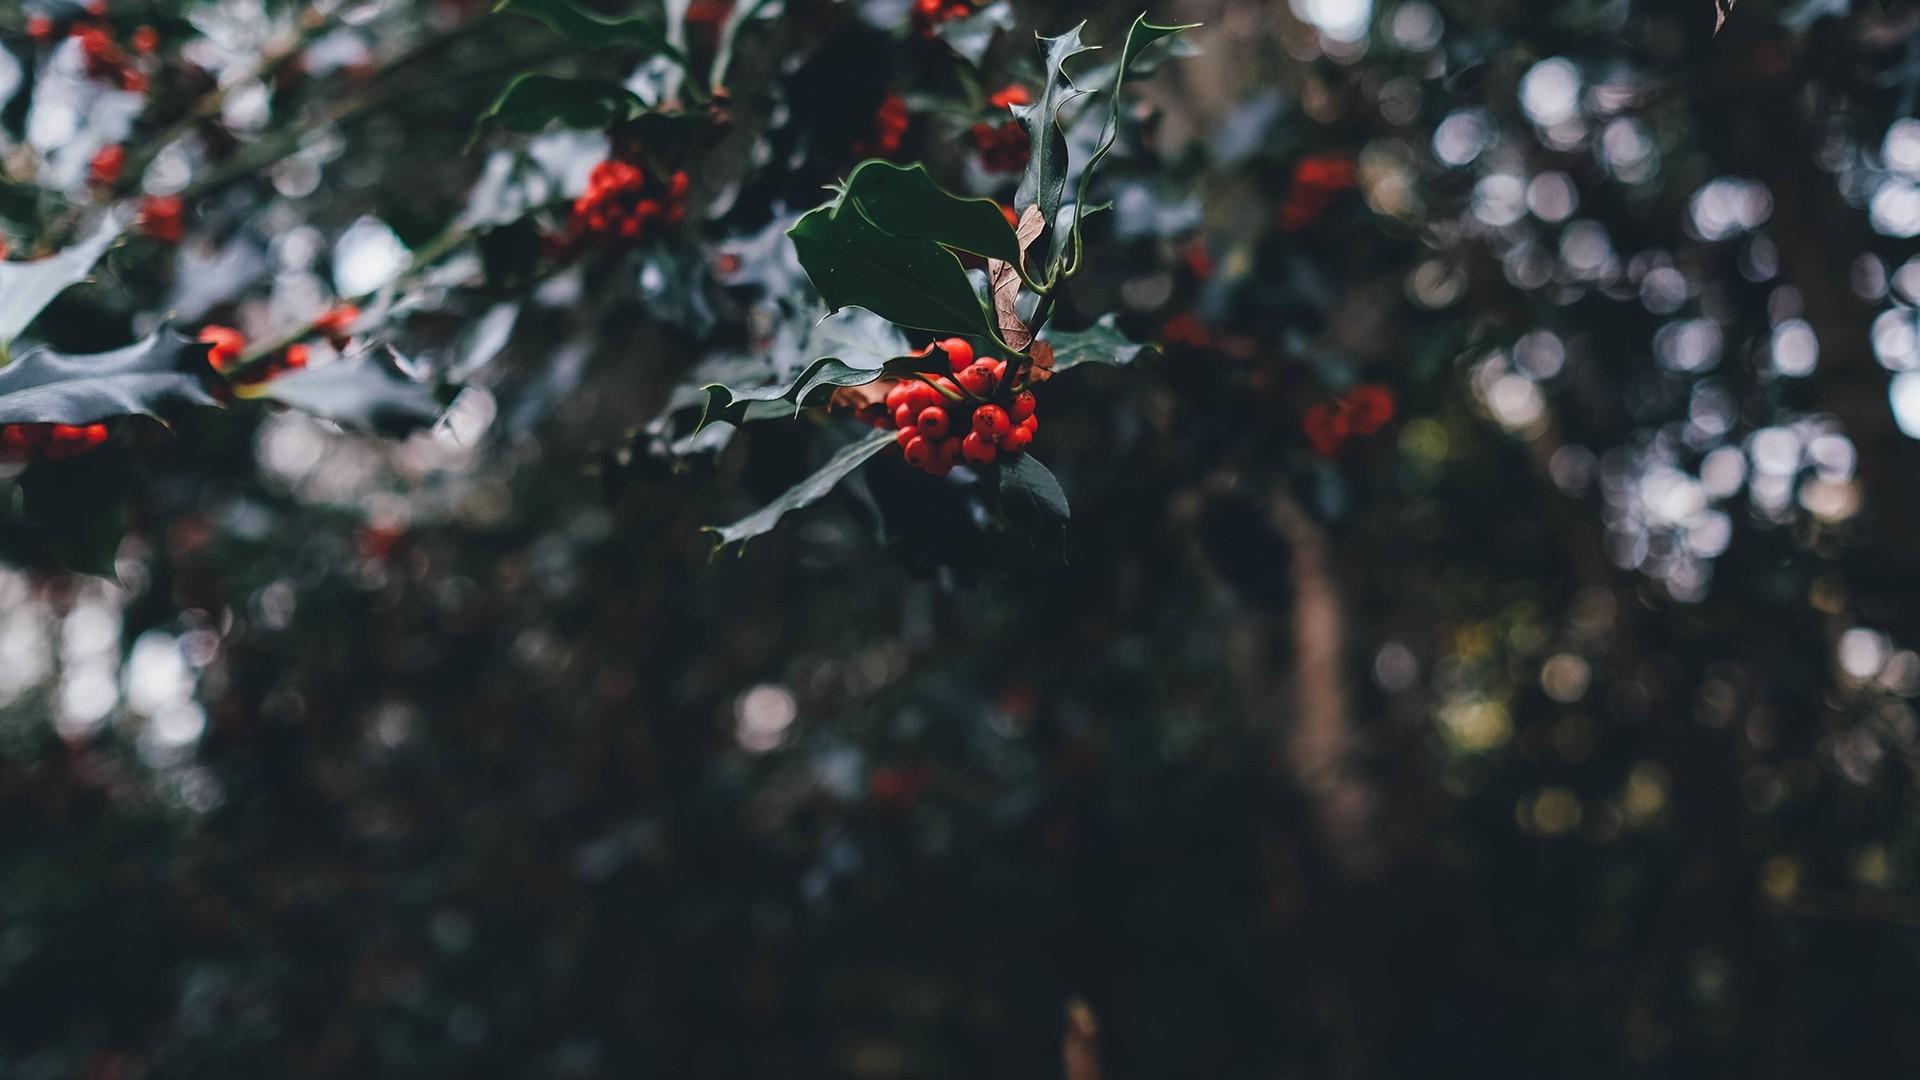 Aesthetic Christmas Background